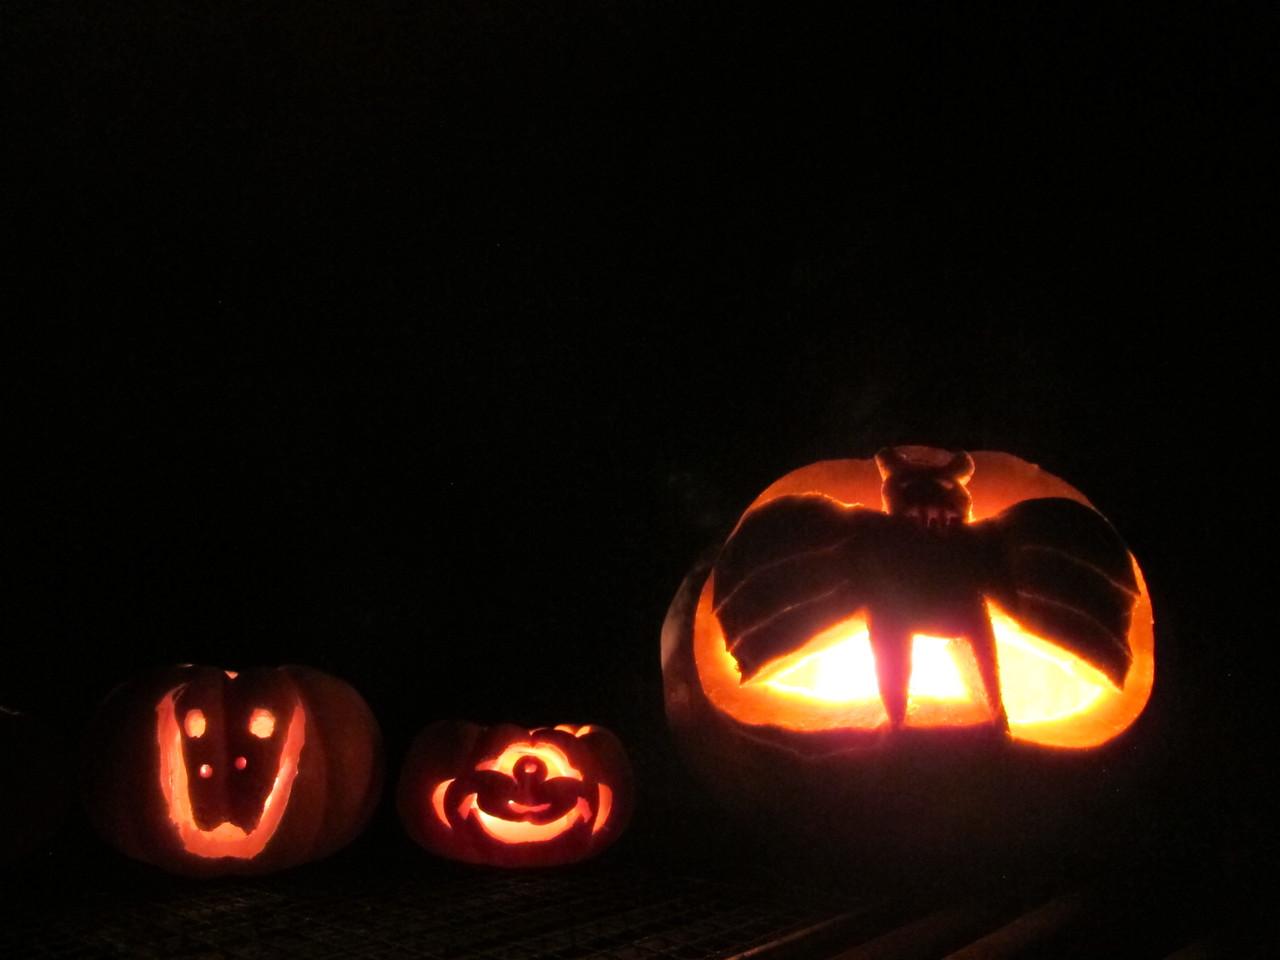 31/10/13 Halloween pumkins carved by us.